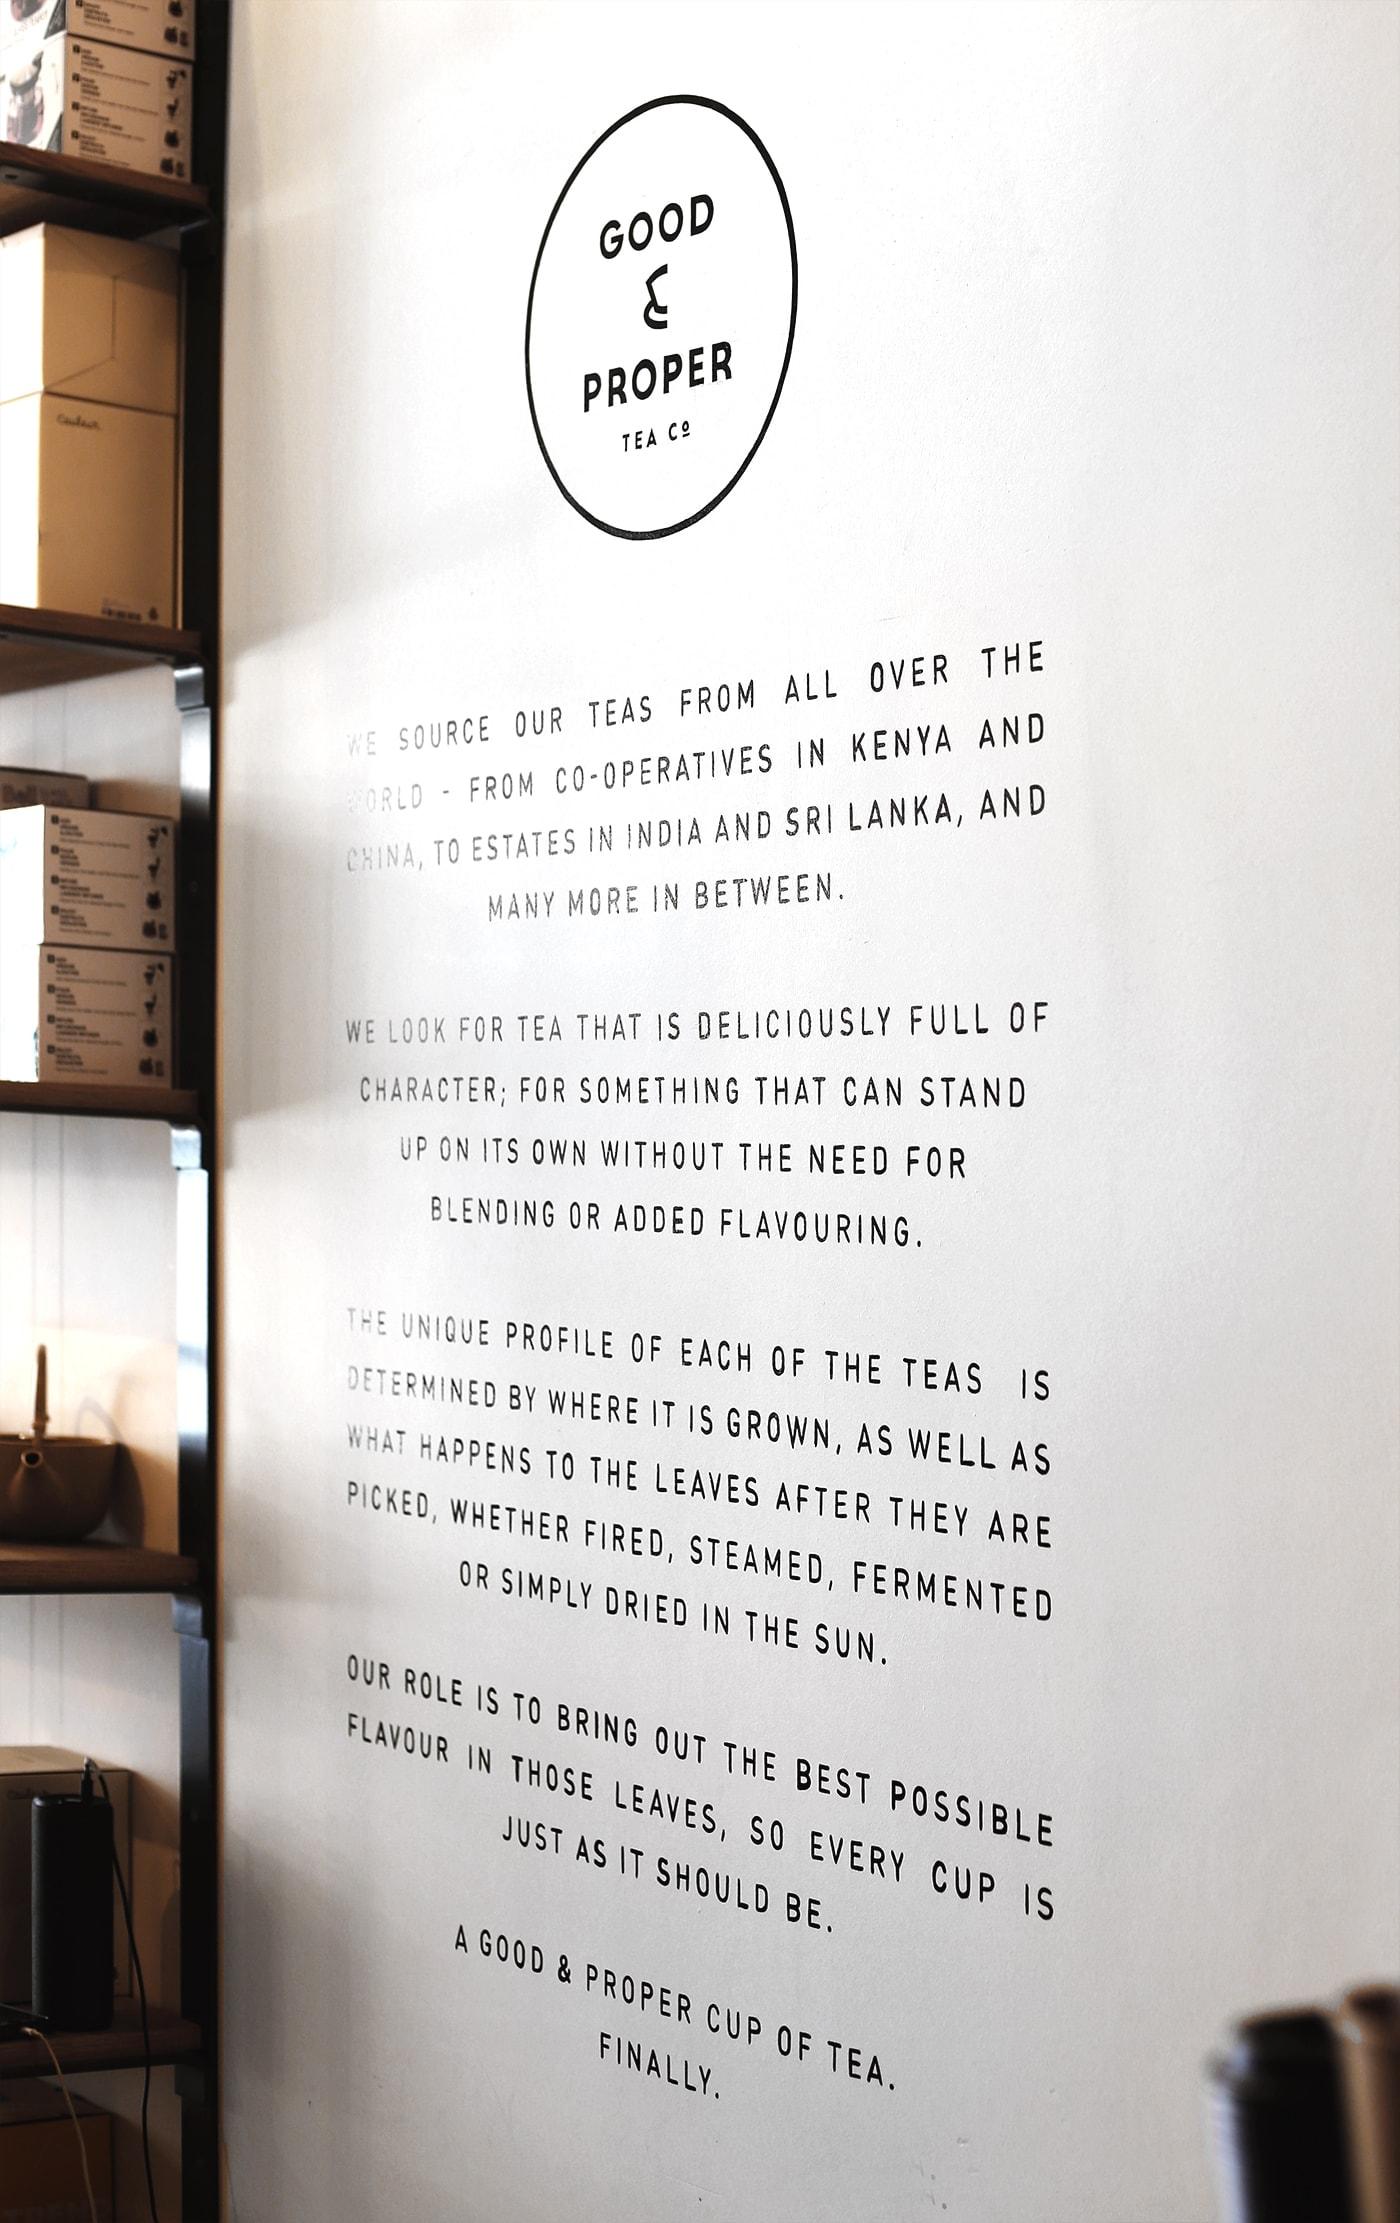 Birthday fun day | Good & Proper Tea philosophy